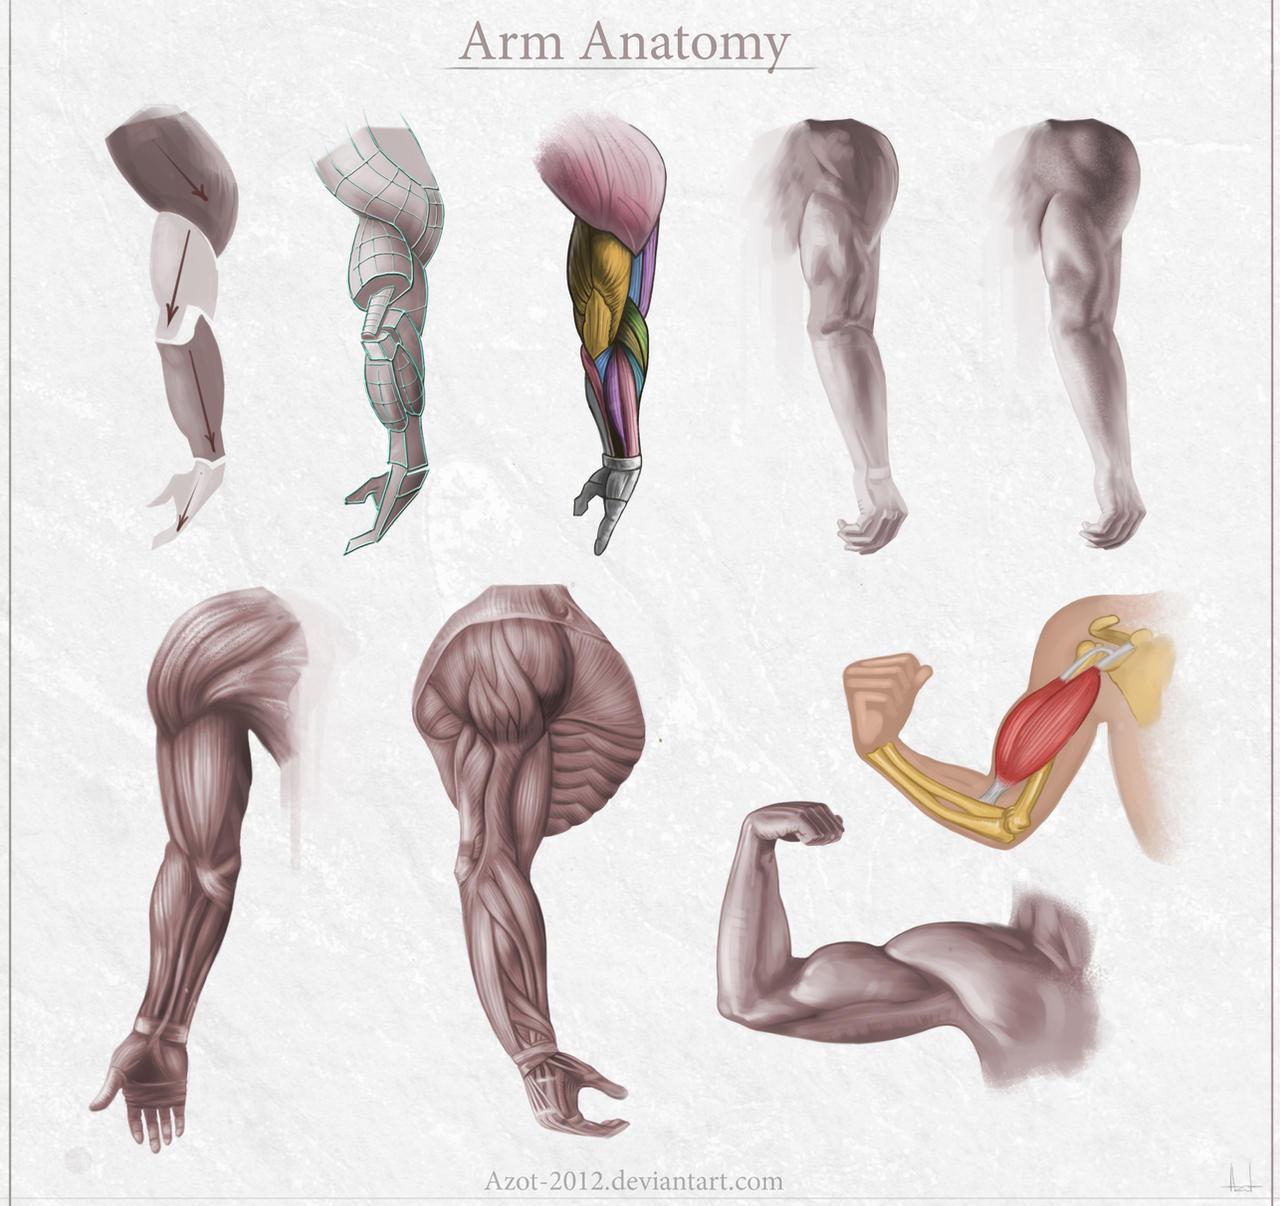 anatomy of arm - Vatoz.atozdevelopment.co